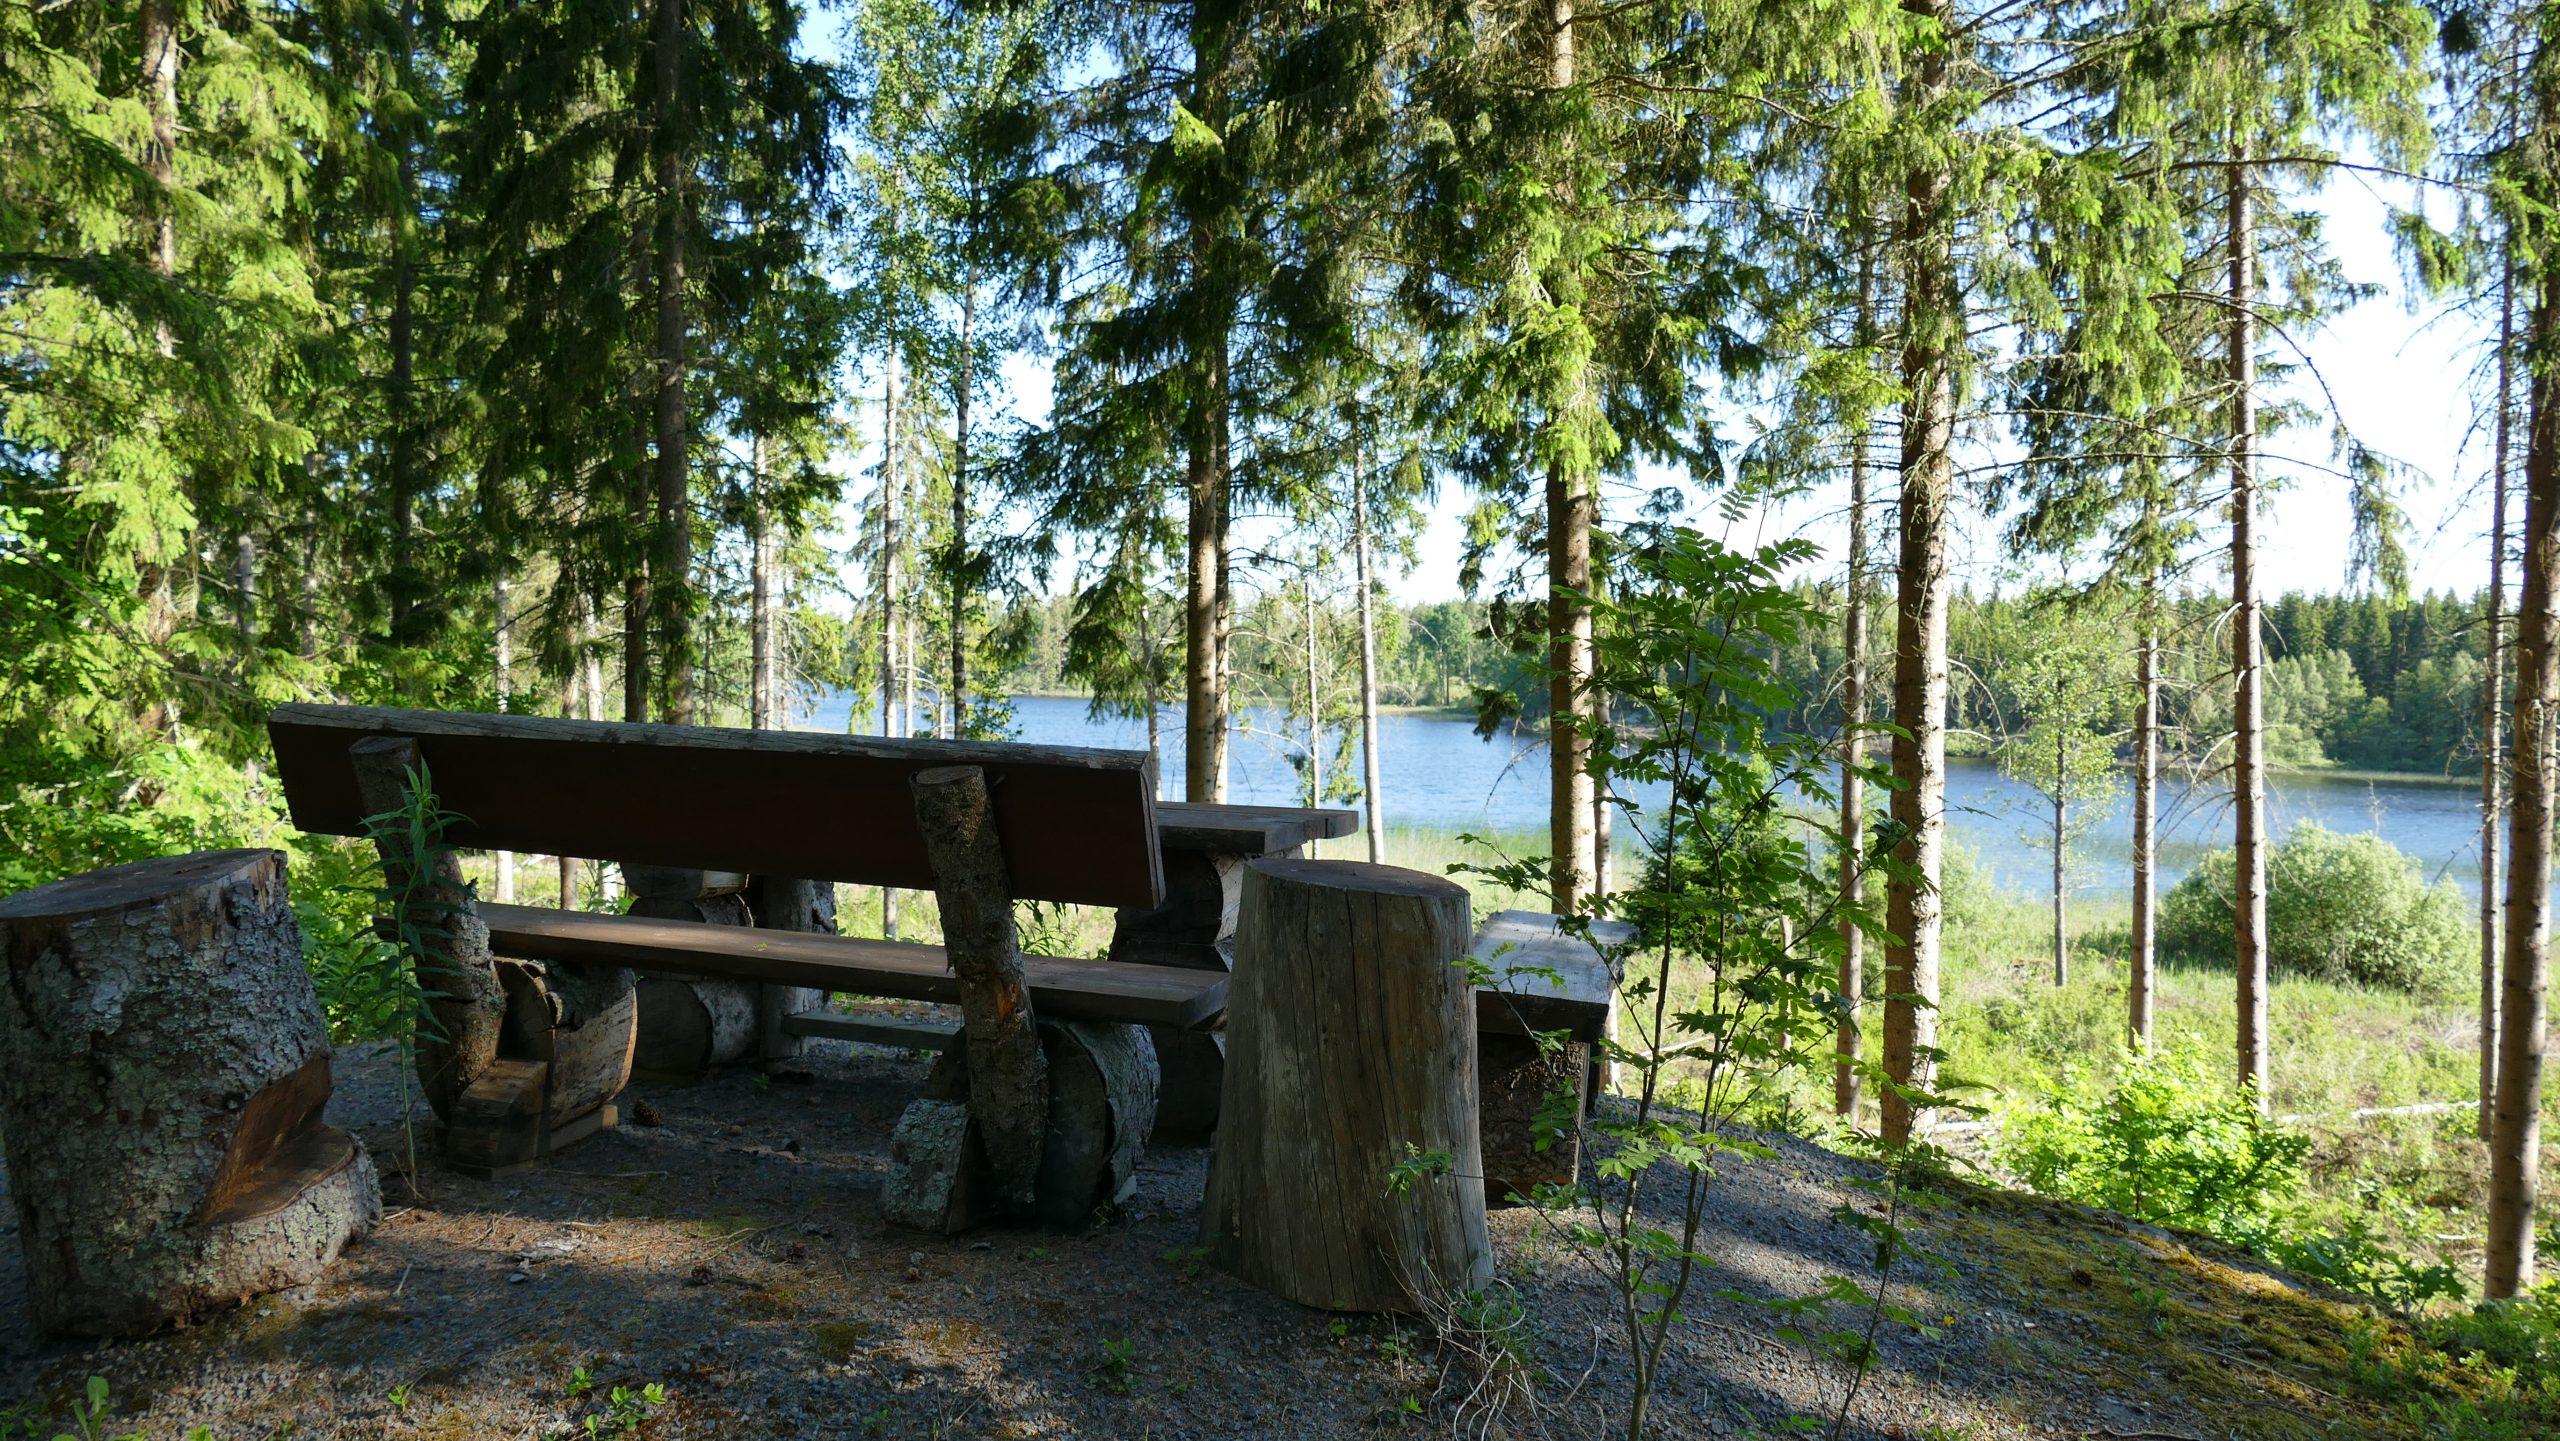 Sitzgruppe am See